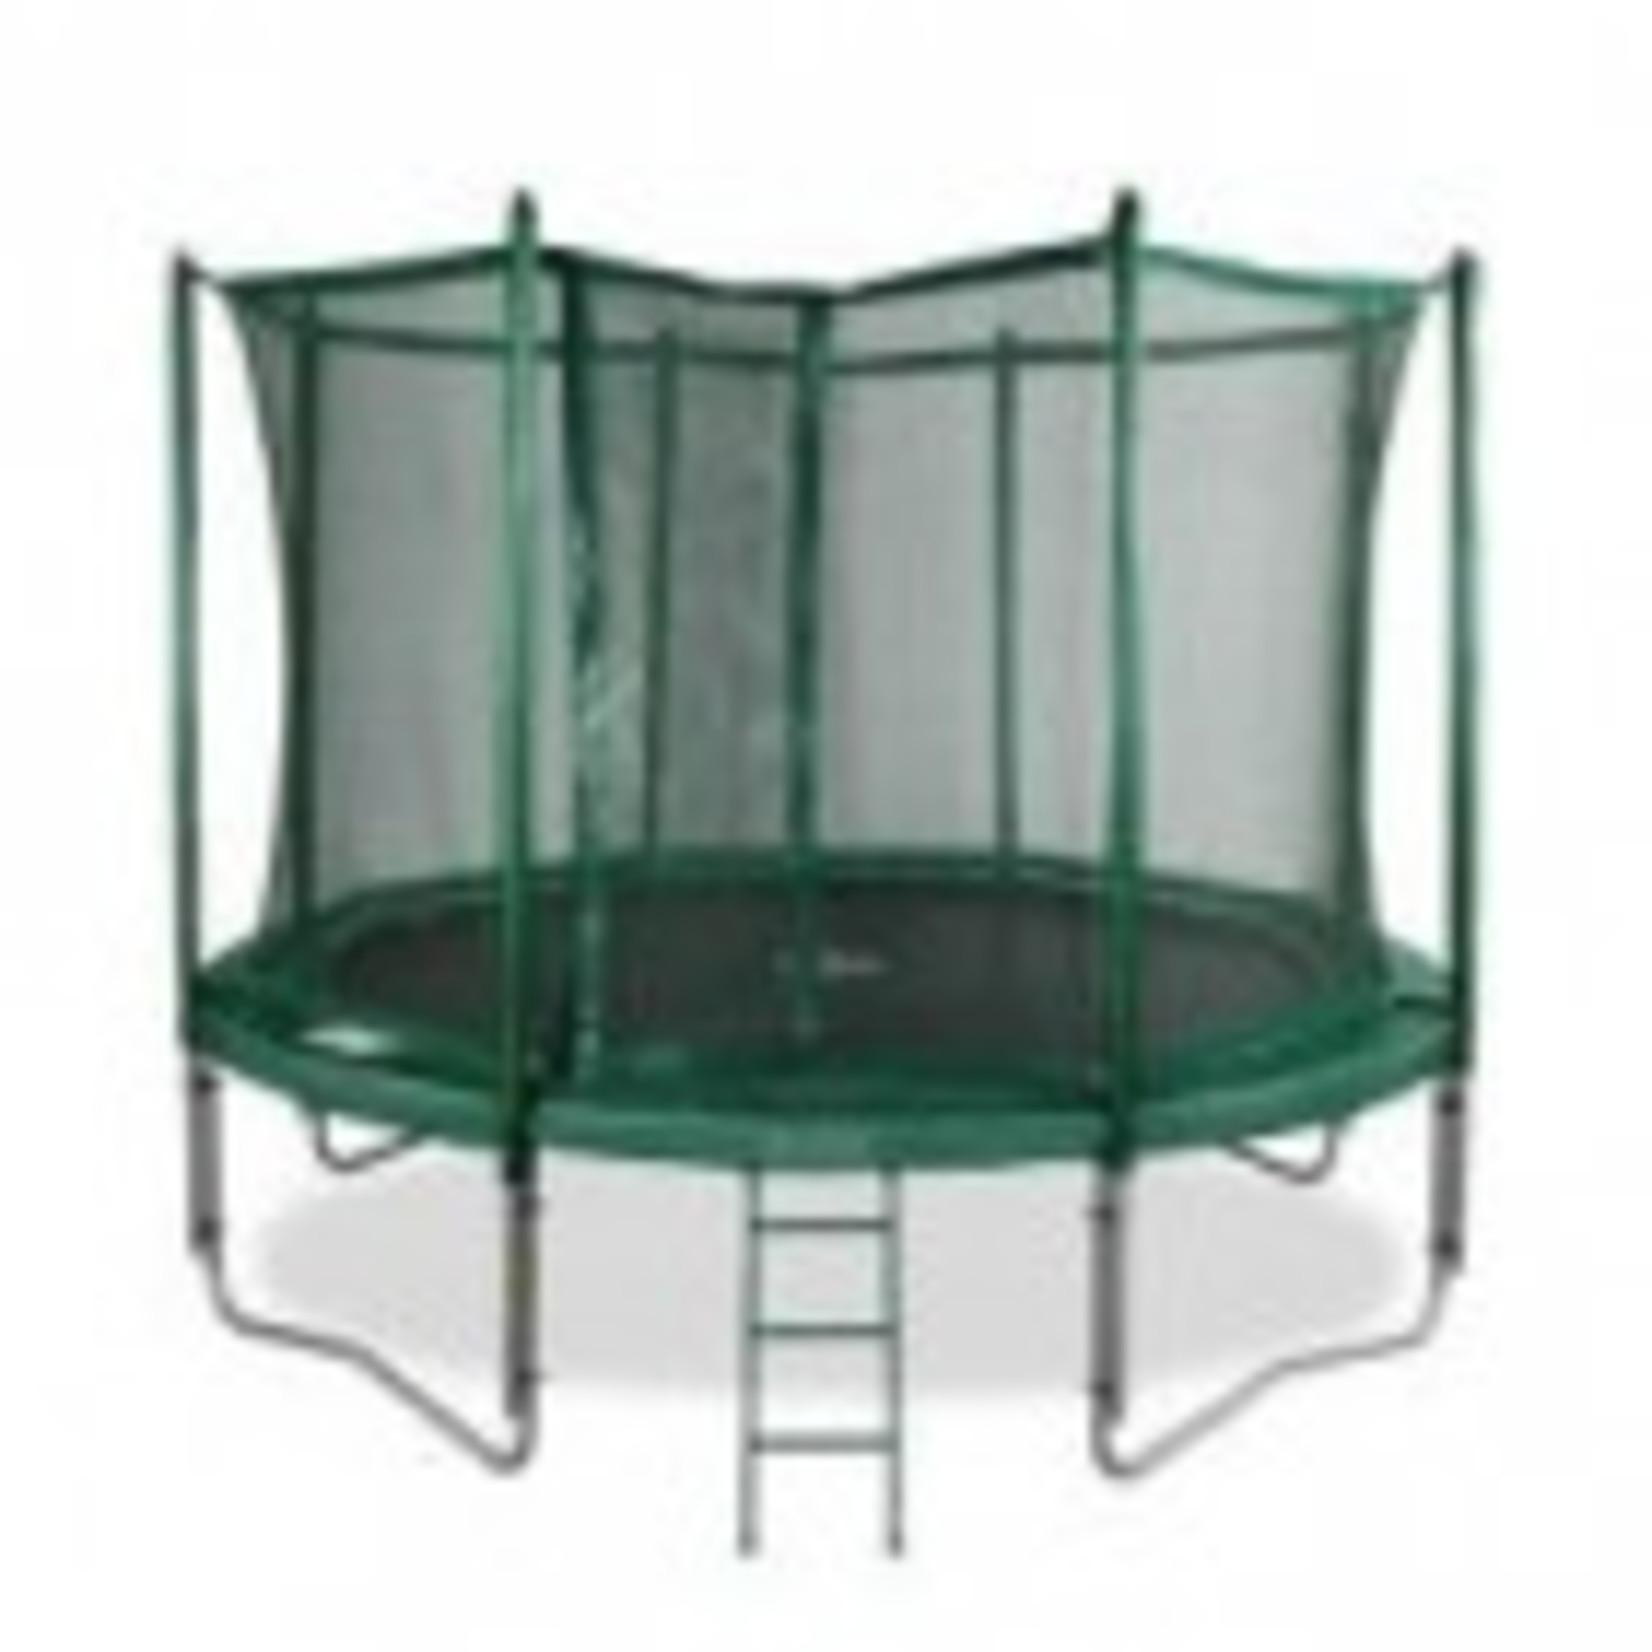 Avyna Top kwaliteit trampoline compleet met veiligheidsnet en trap.Doorsnee 200cm en hoogte 41cm